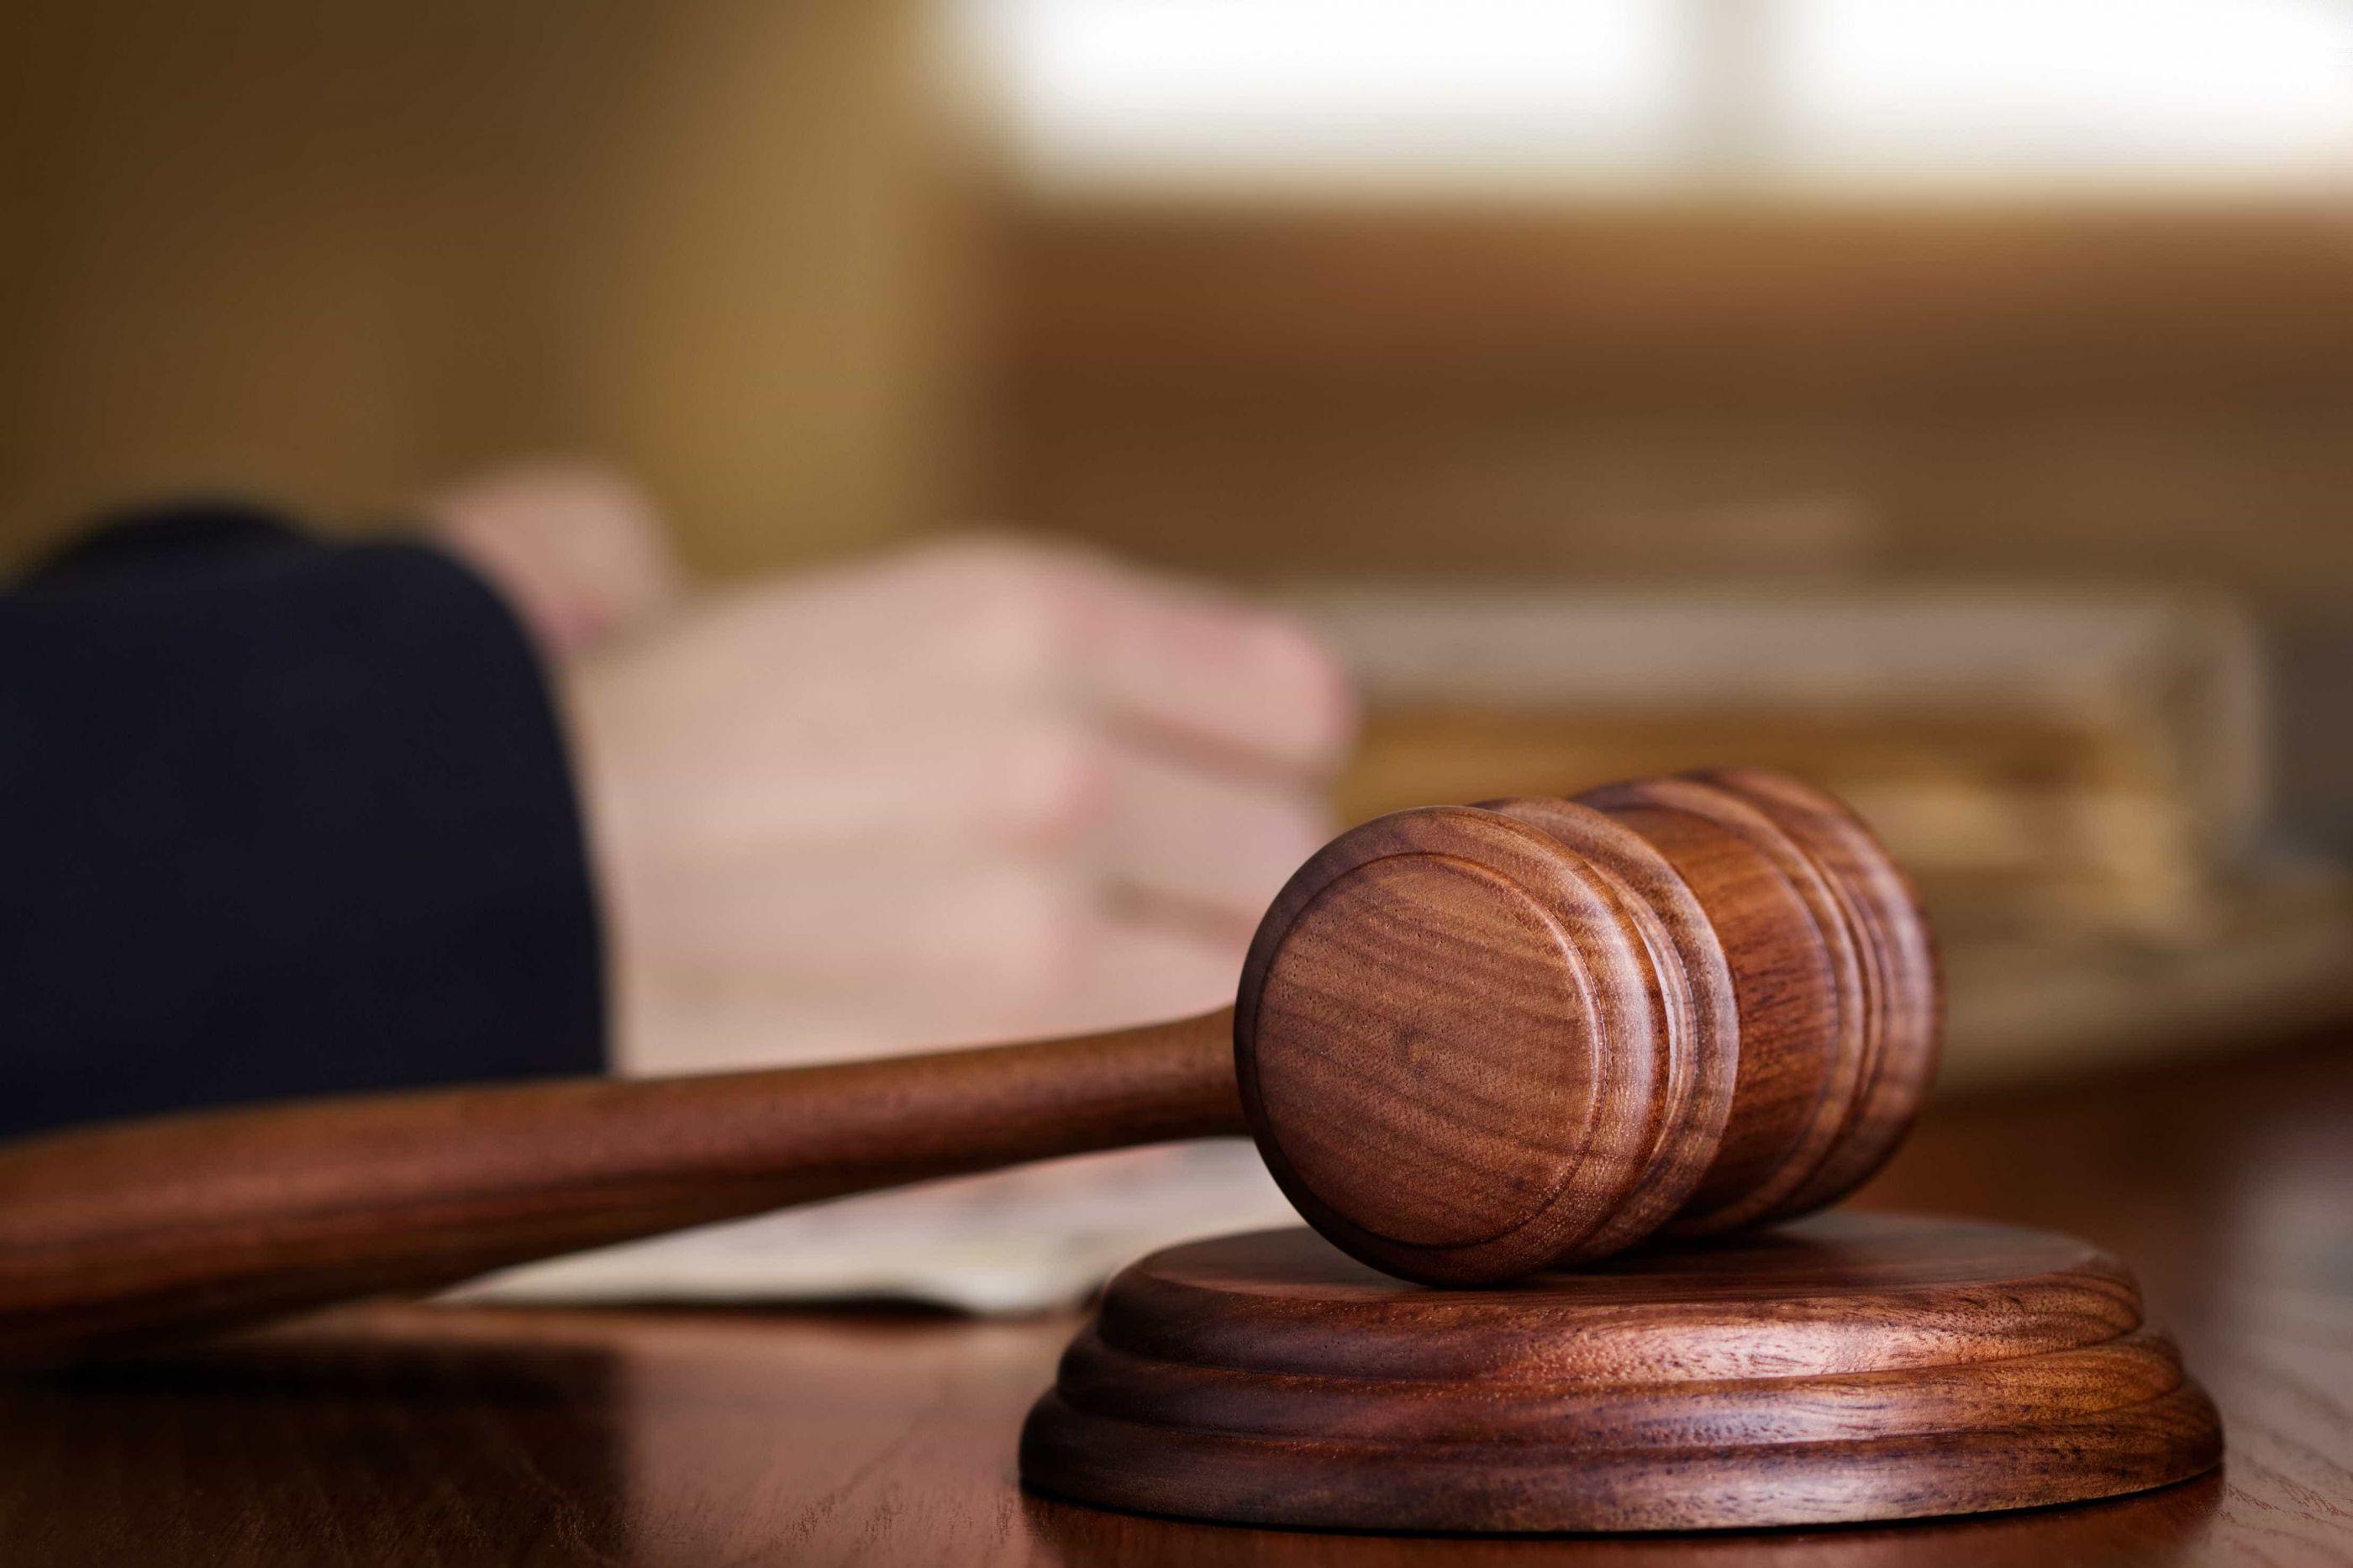 Justiça húngara decide extraditar Rui Pinto para Portugal. Hacker recorre